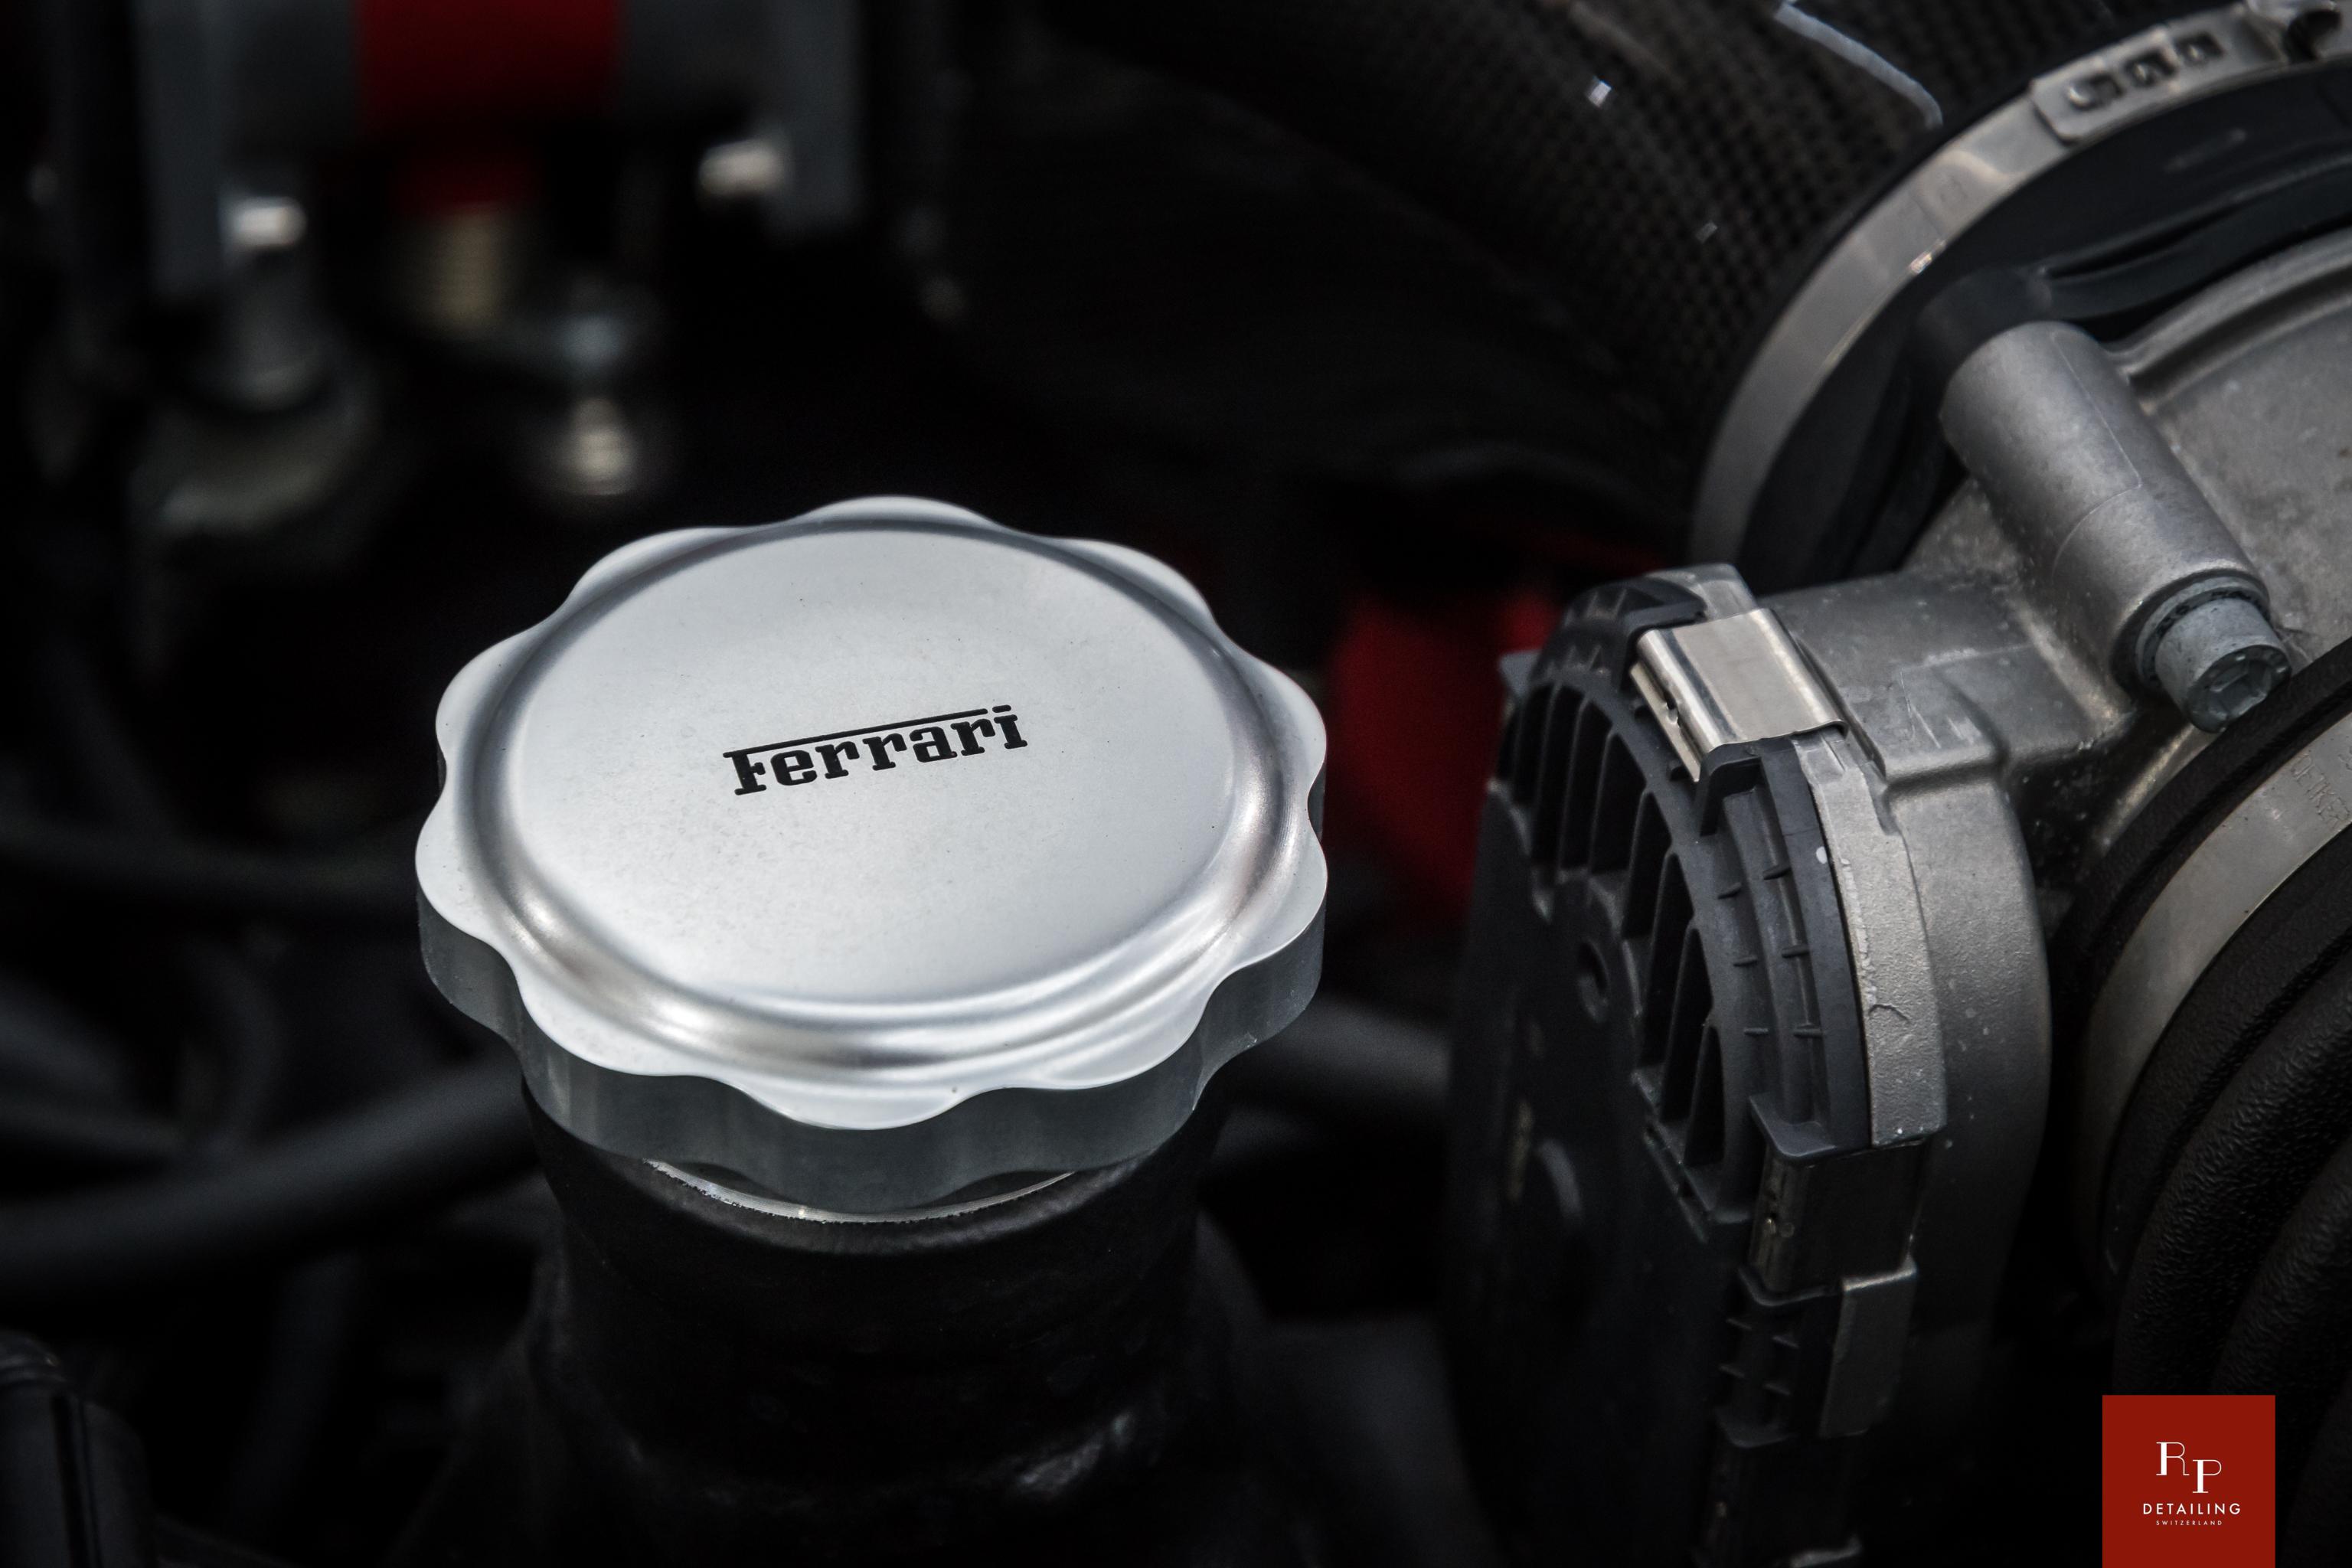 Ferrari%20Speciale%20RP%2015.jpg